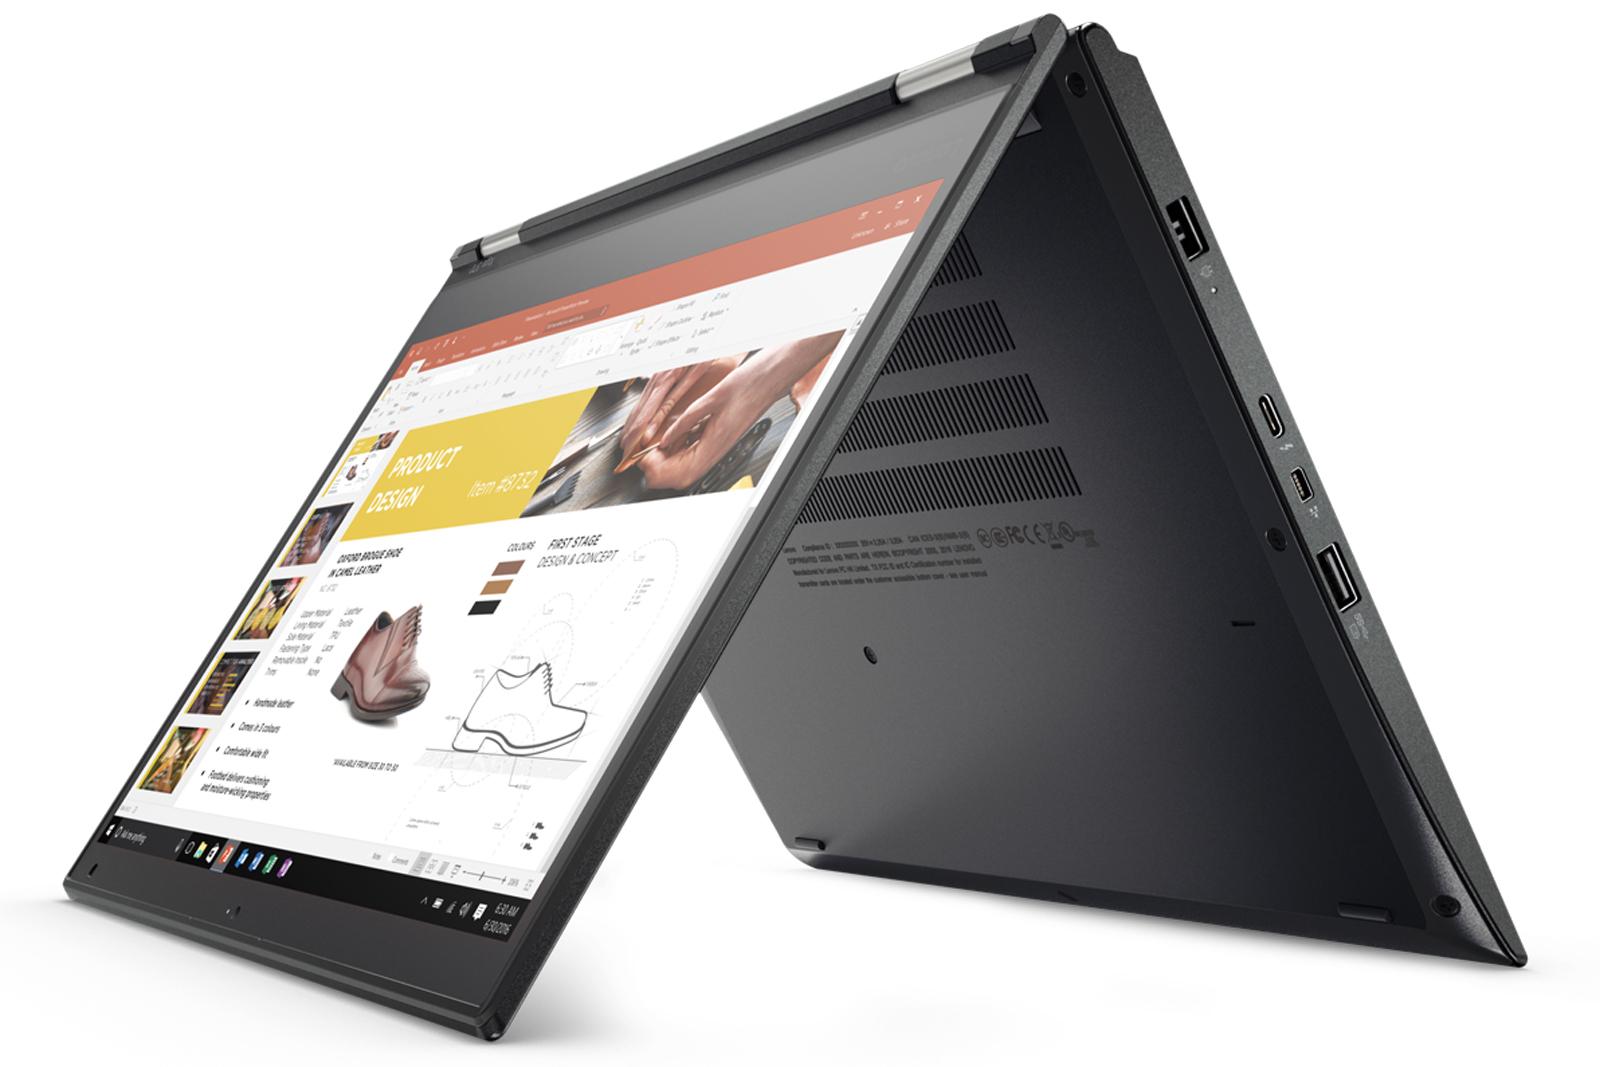 Lenovo's latest ThinkPads ship bloatware-free - AIVAnet